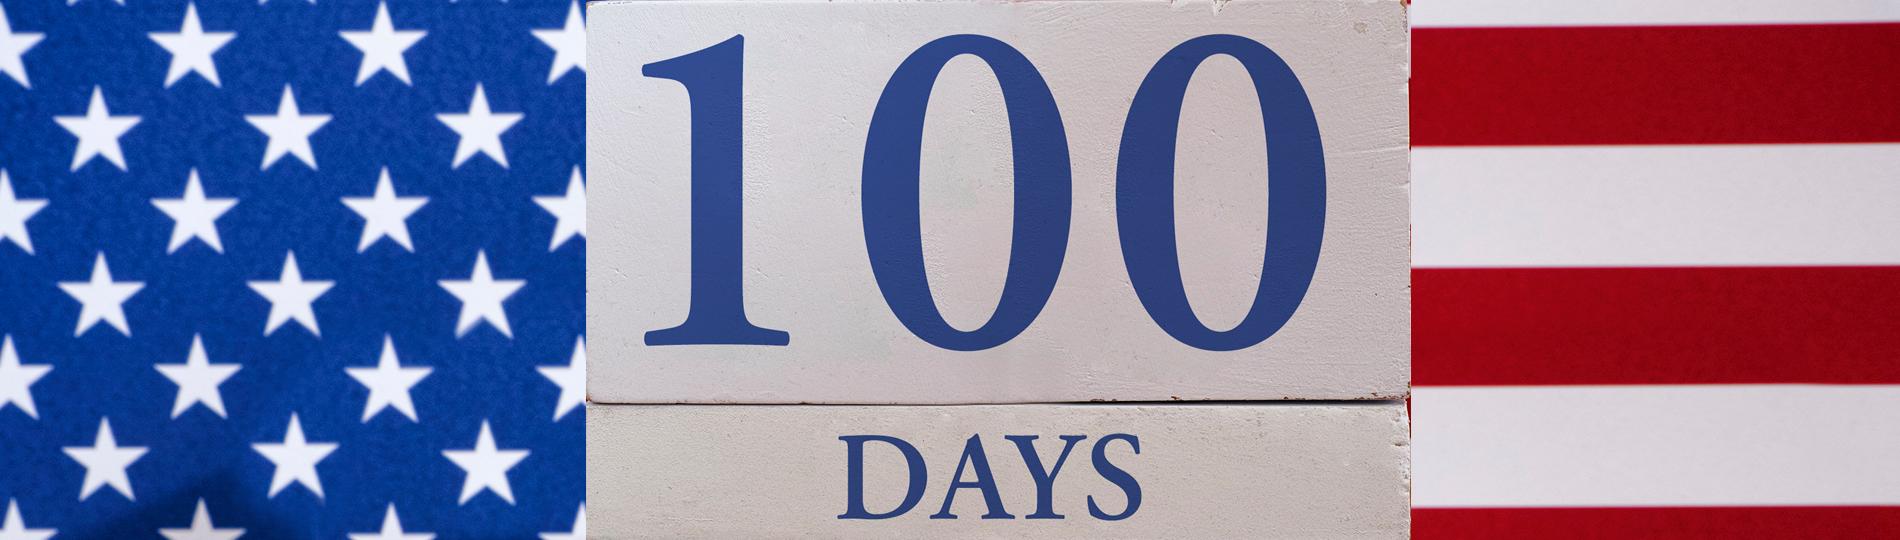 DW 100 Days | American Academy of Dermatology